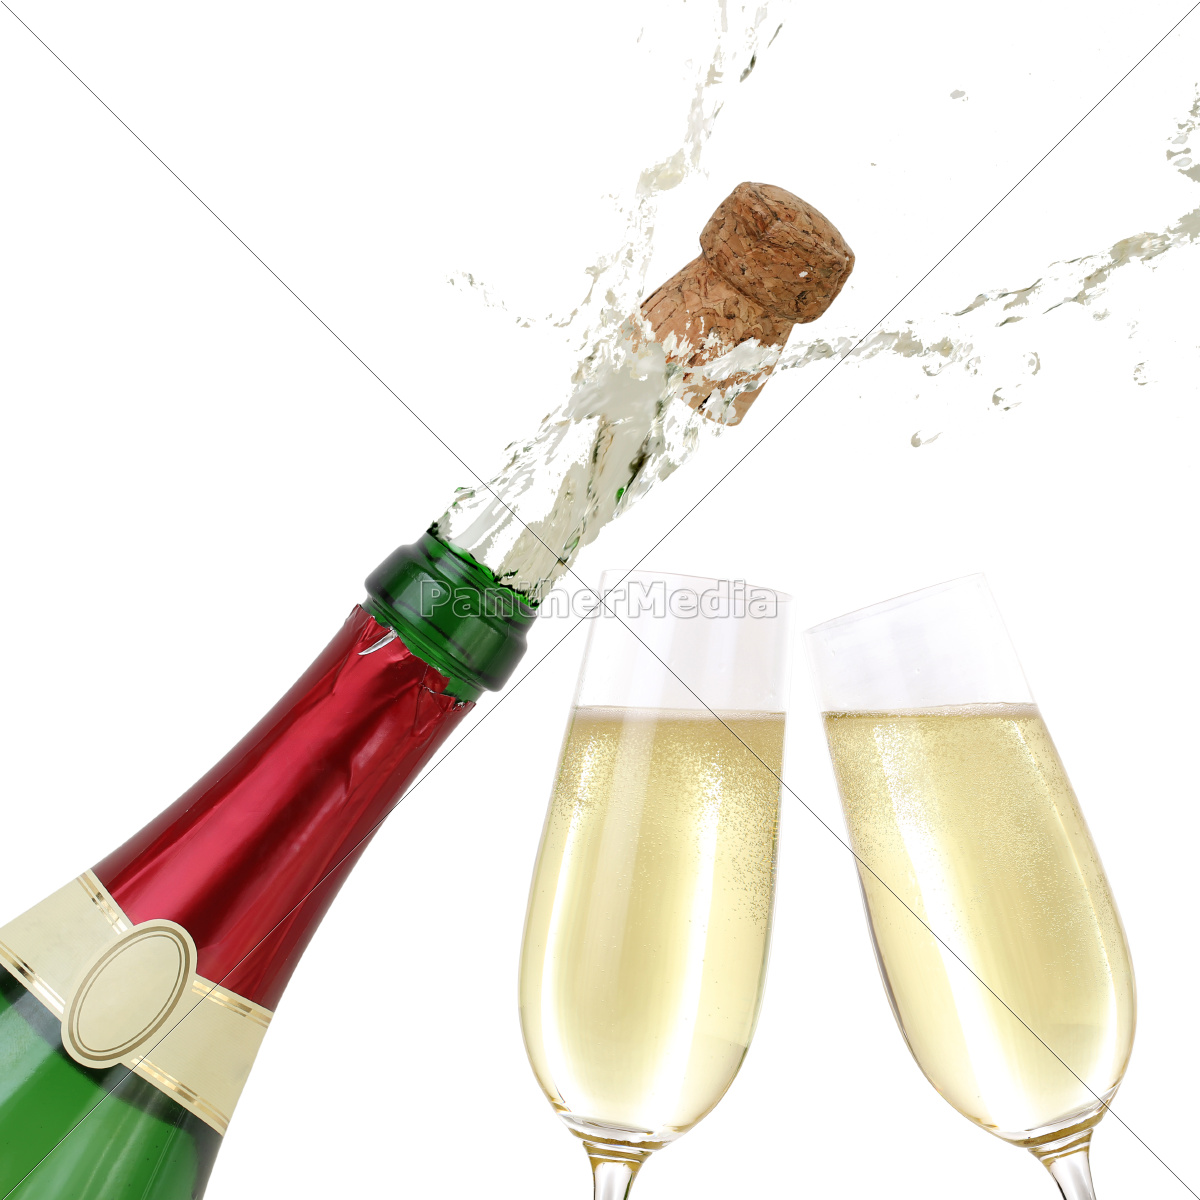 champagner spritzt aus flasche lizenzfreies bild champagne bottle clip art gold png champagne bottle image clipart